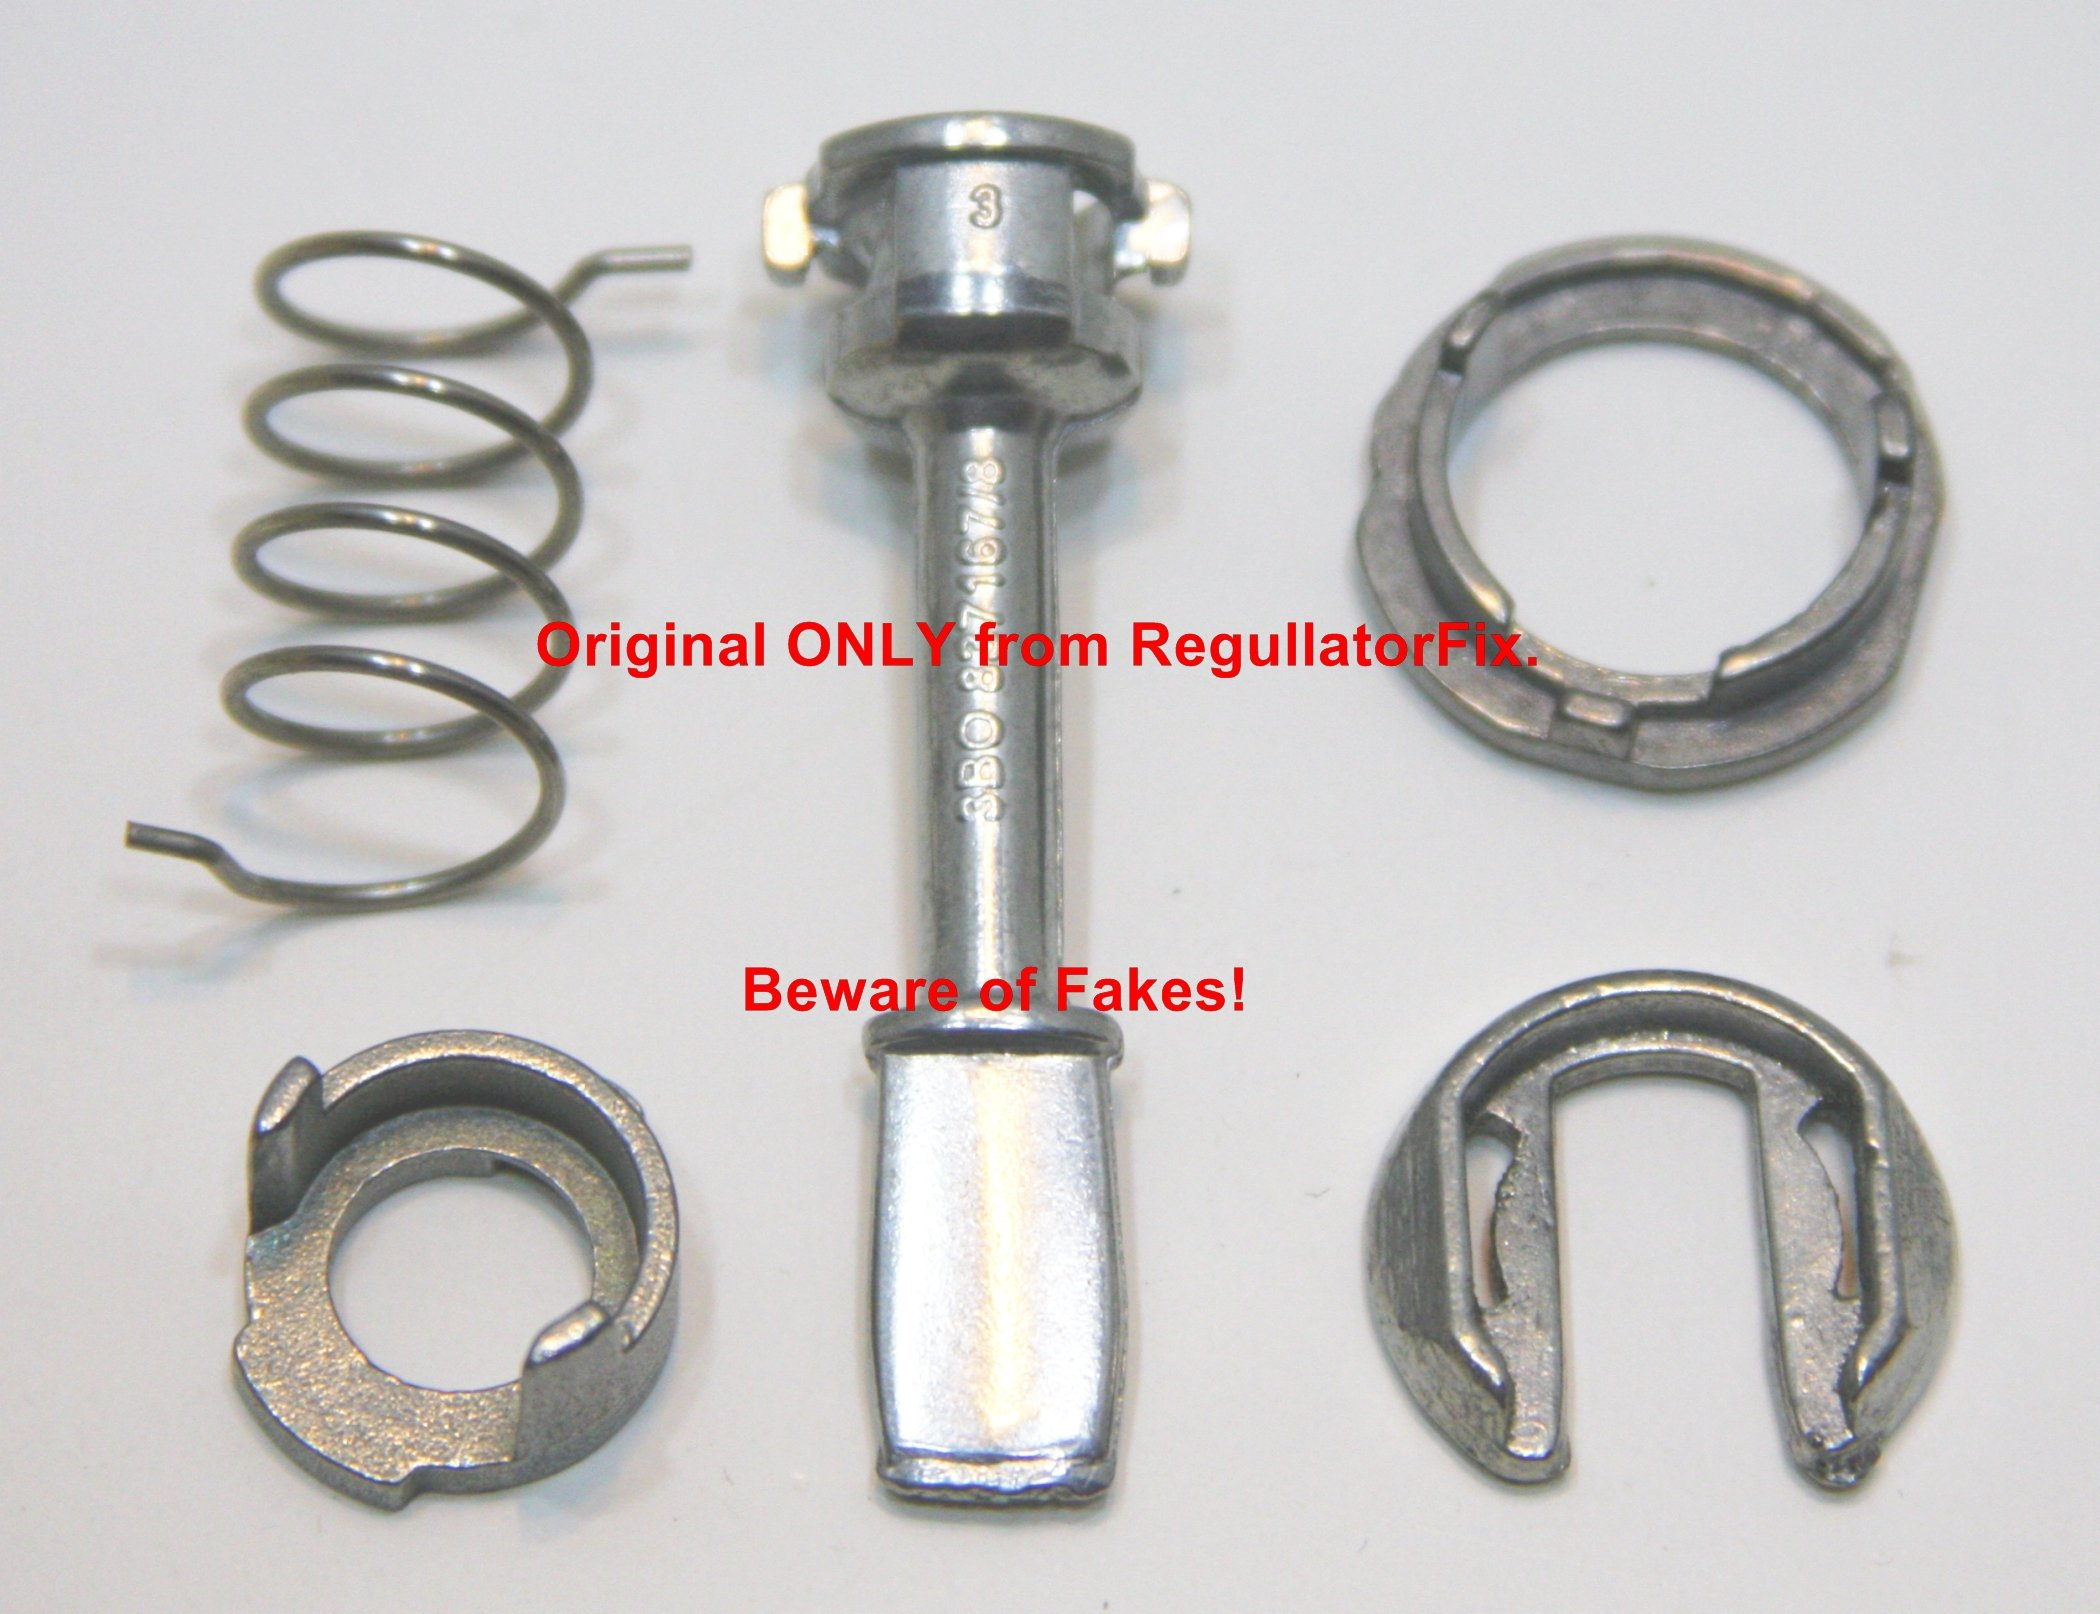 Passat Door Lock Repair Kit